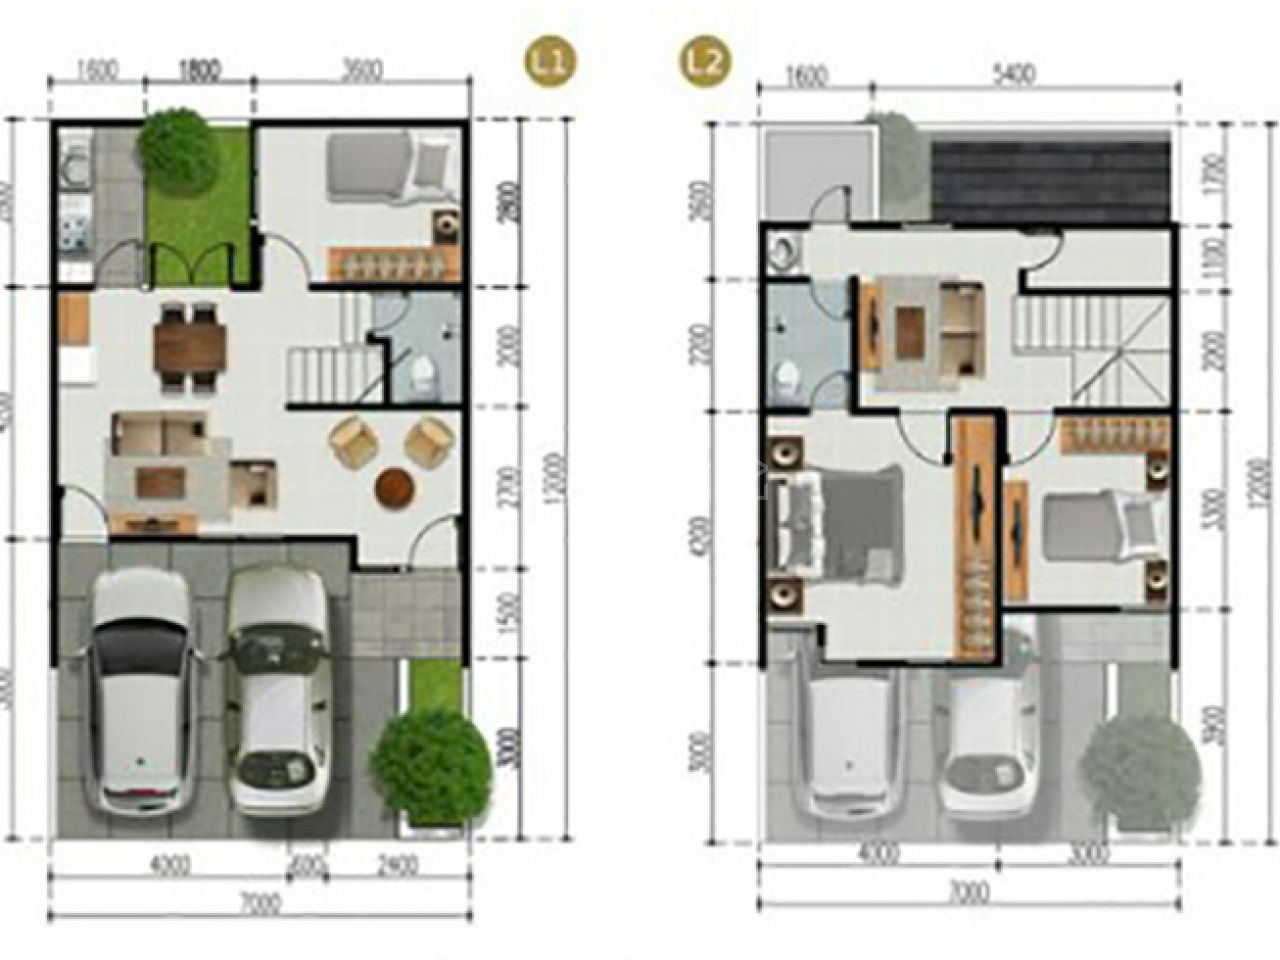 Rumah Townhouse Ideal dan Strategis di Jakarta Timur, DKI Jakarta